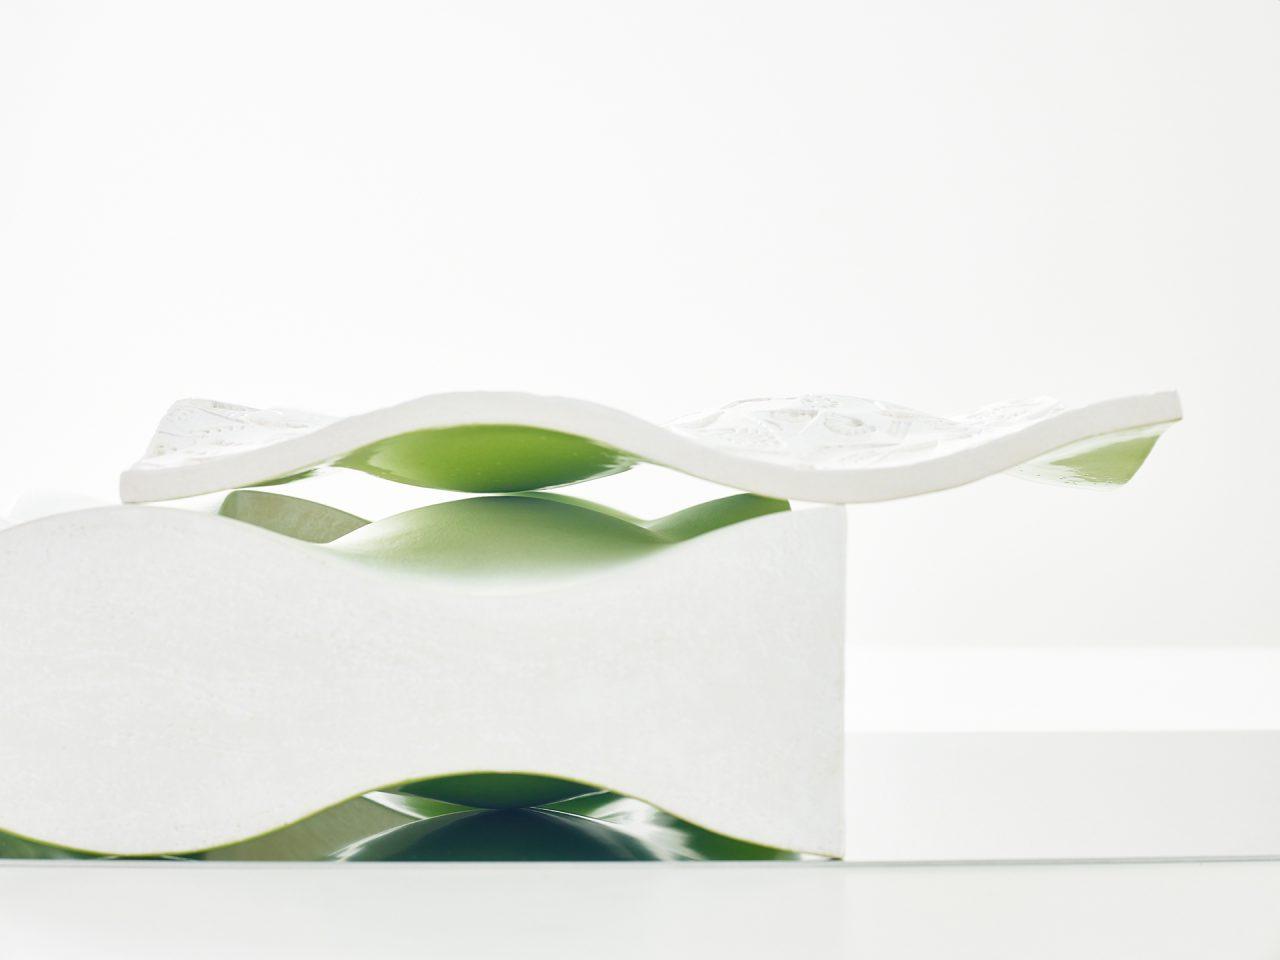 Kyra Spieker, Keramik, Glas, Frechen, Ausstellung, Kunst, Abstrakt, Produktfotografie, AR, Articus & Röttgen, Grün, Helge Articus, Fotografie